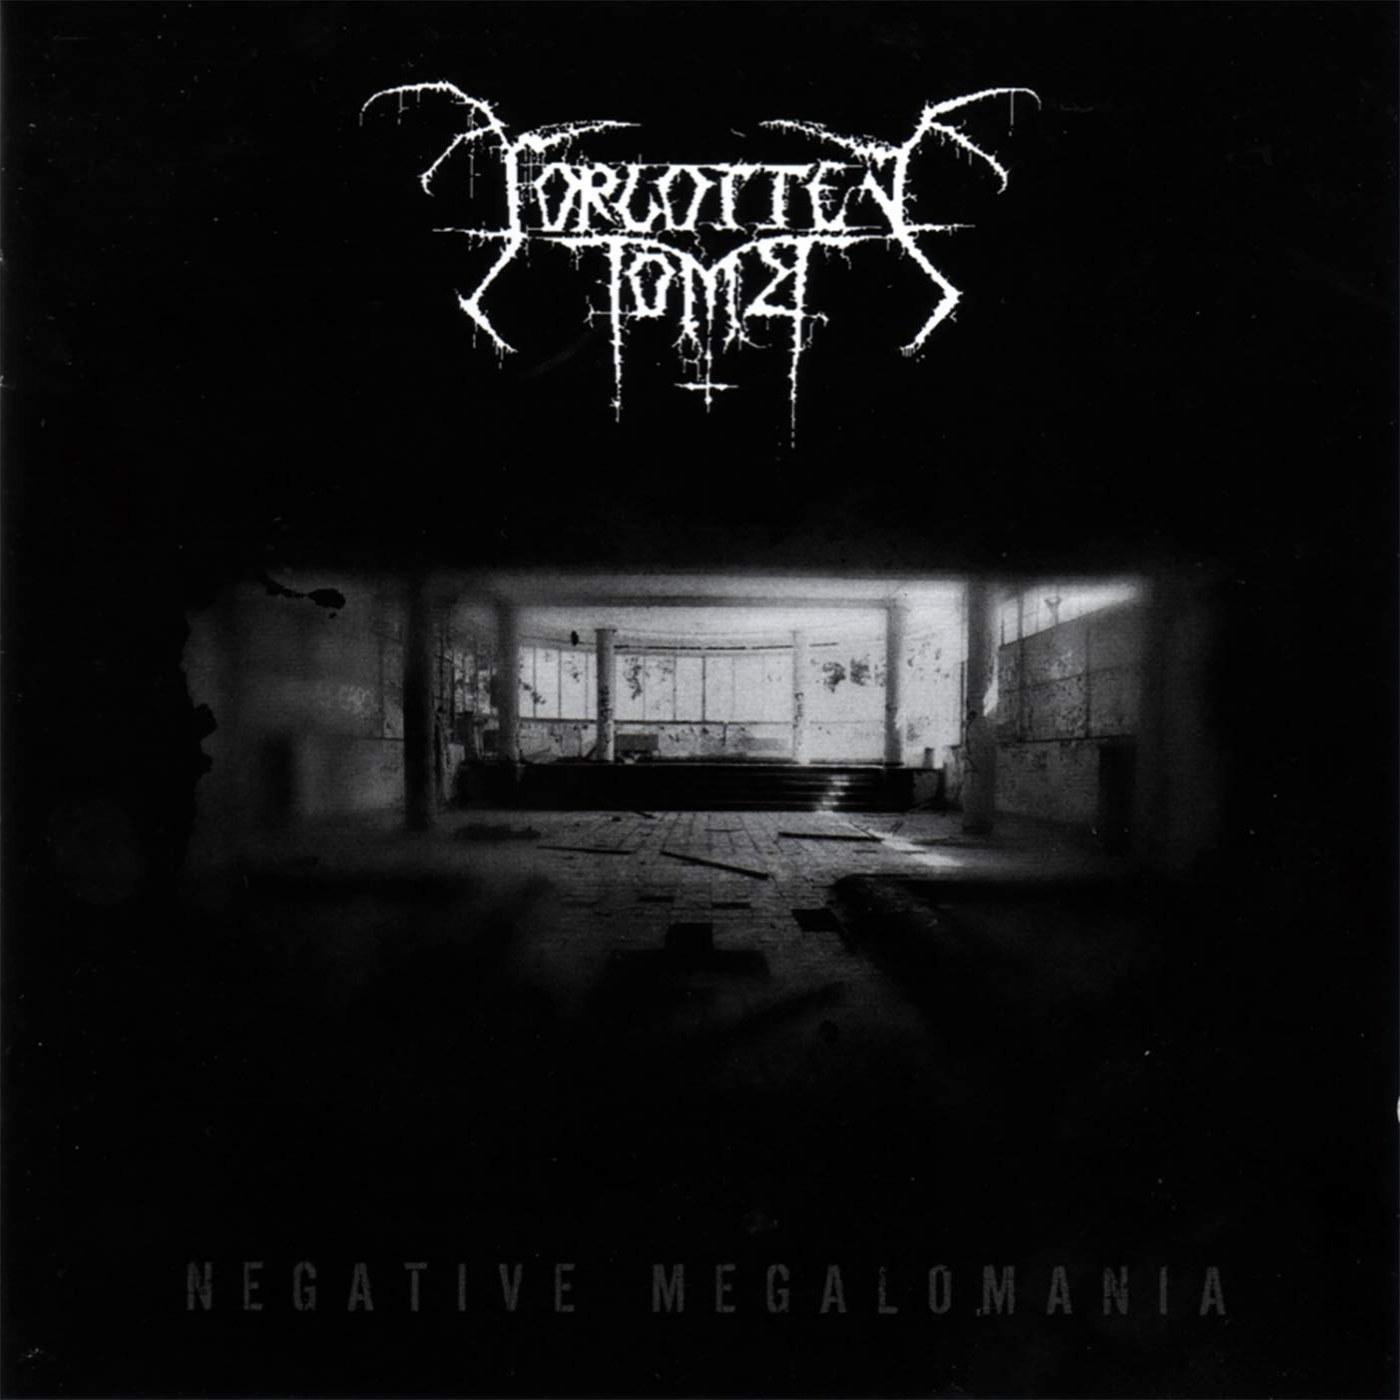 Forgotten Tomb - Negative Megalomania